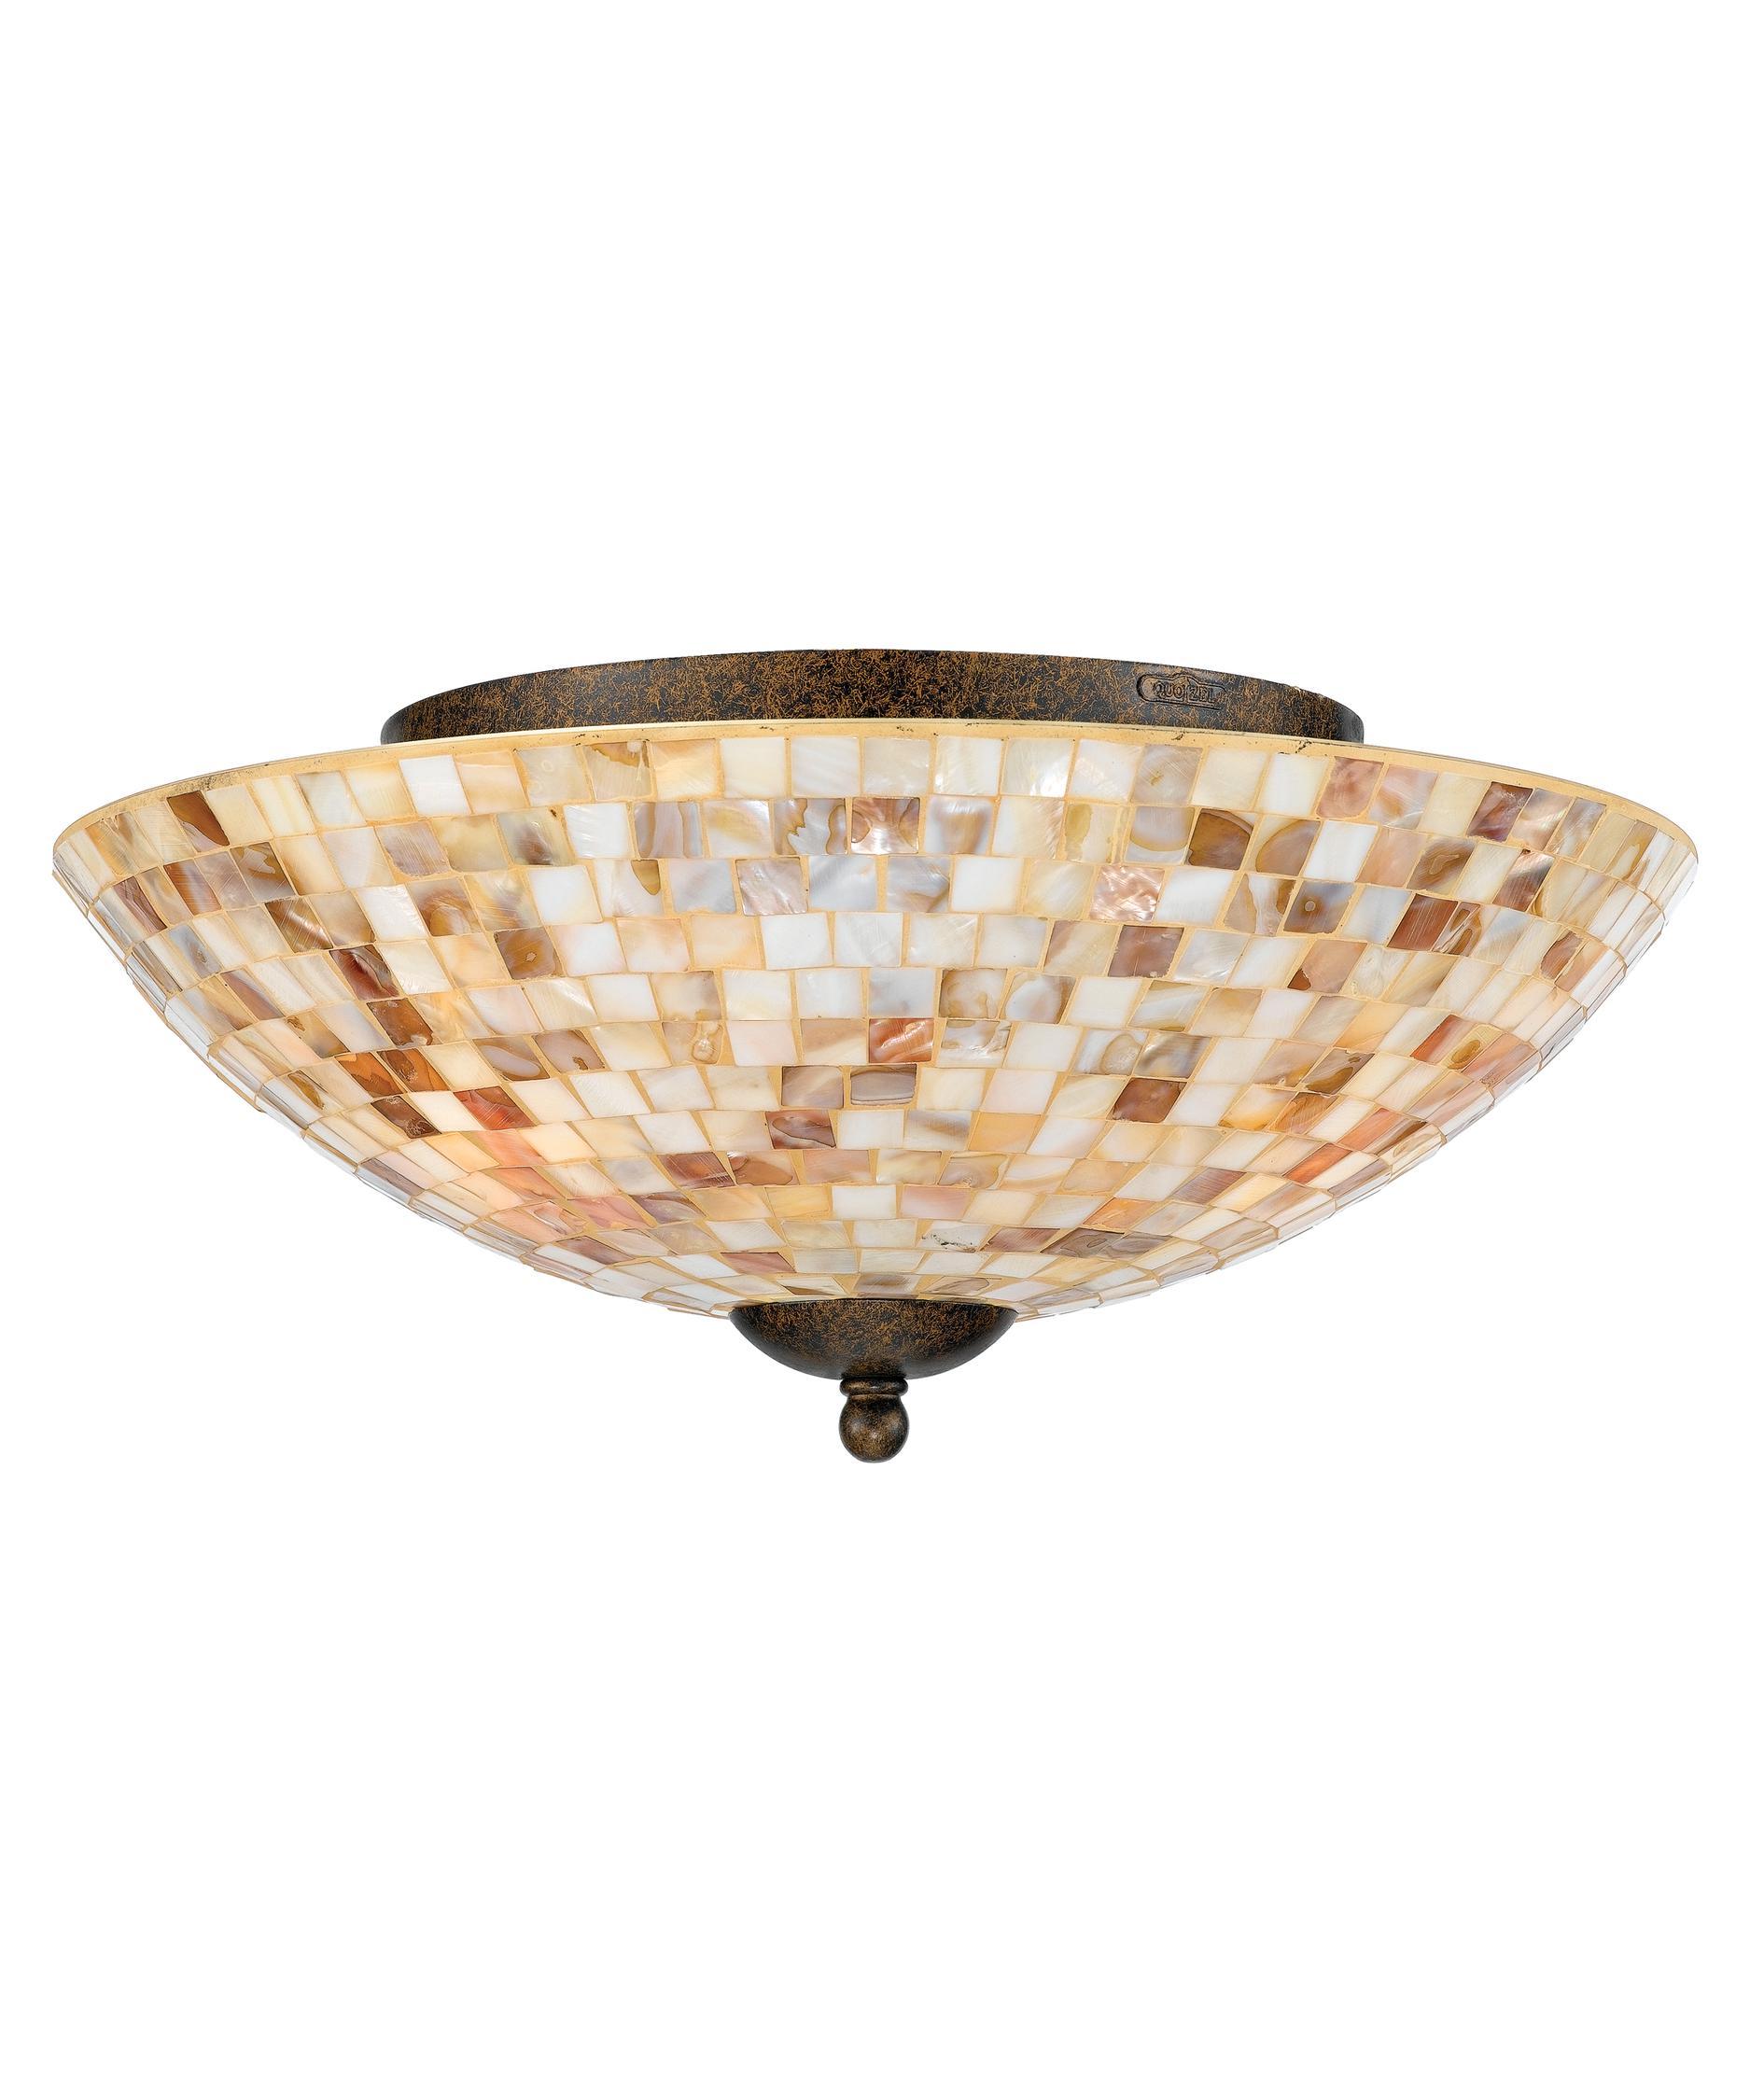 quoizel my1613 monterey mosaic 16 inch wide flush mount capitol lighting